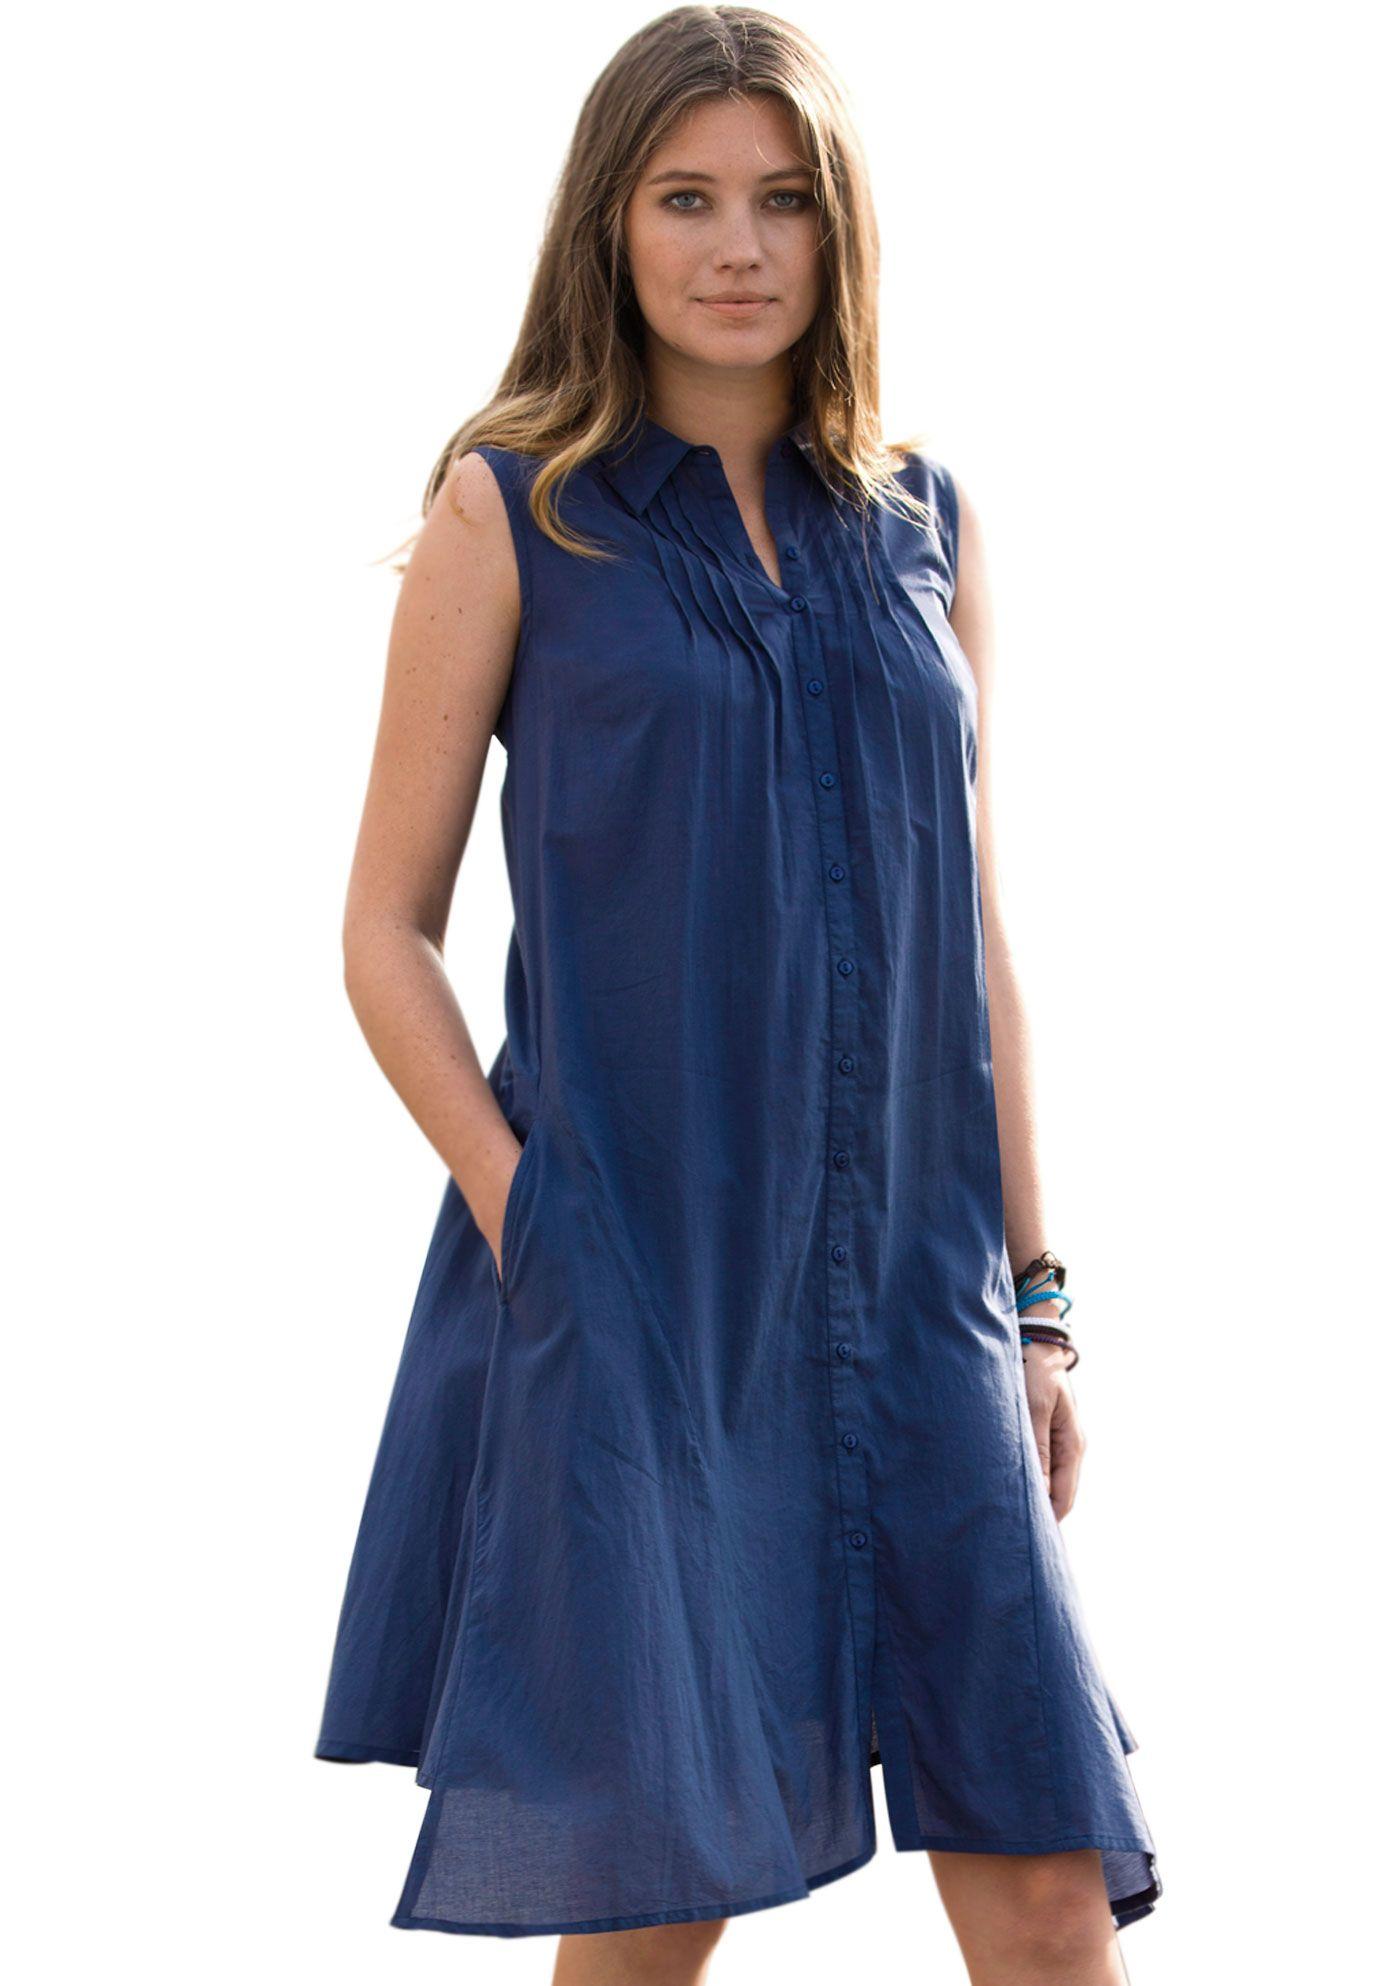 Women\'s Plus Size Casual Dresses & Day Dresses   Woman ...